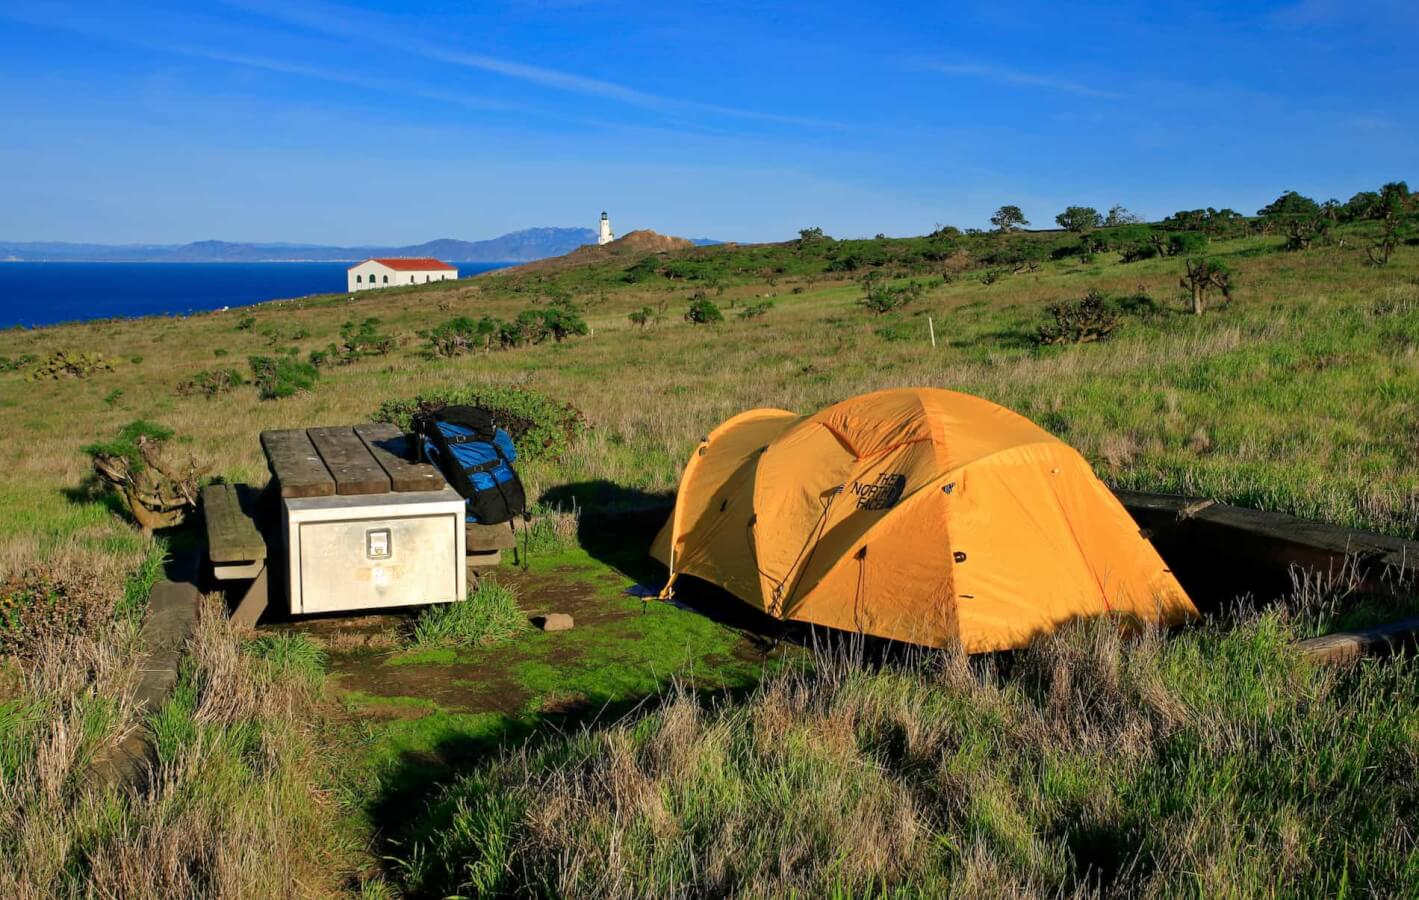 Camping on Anacapa island